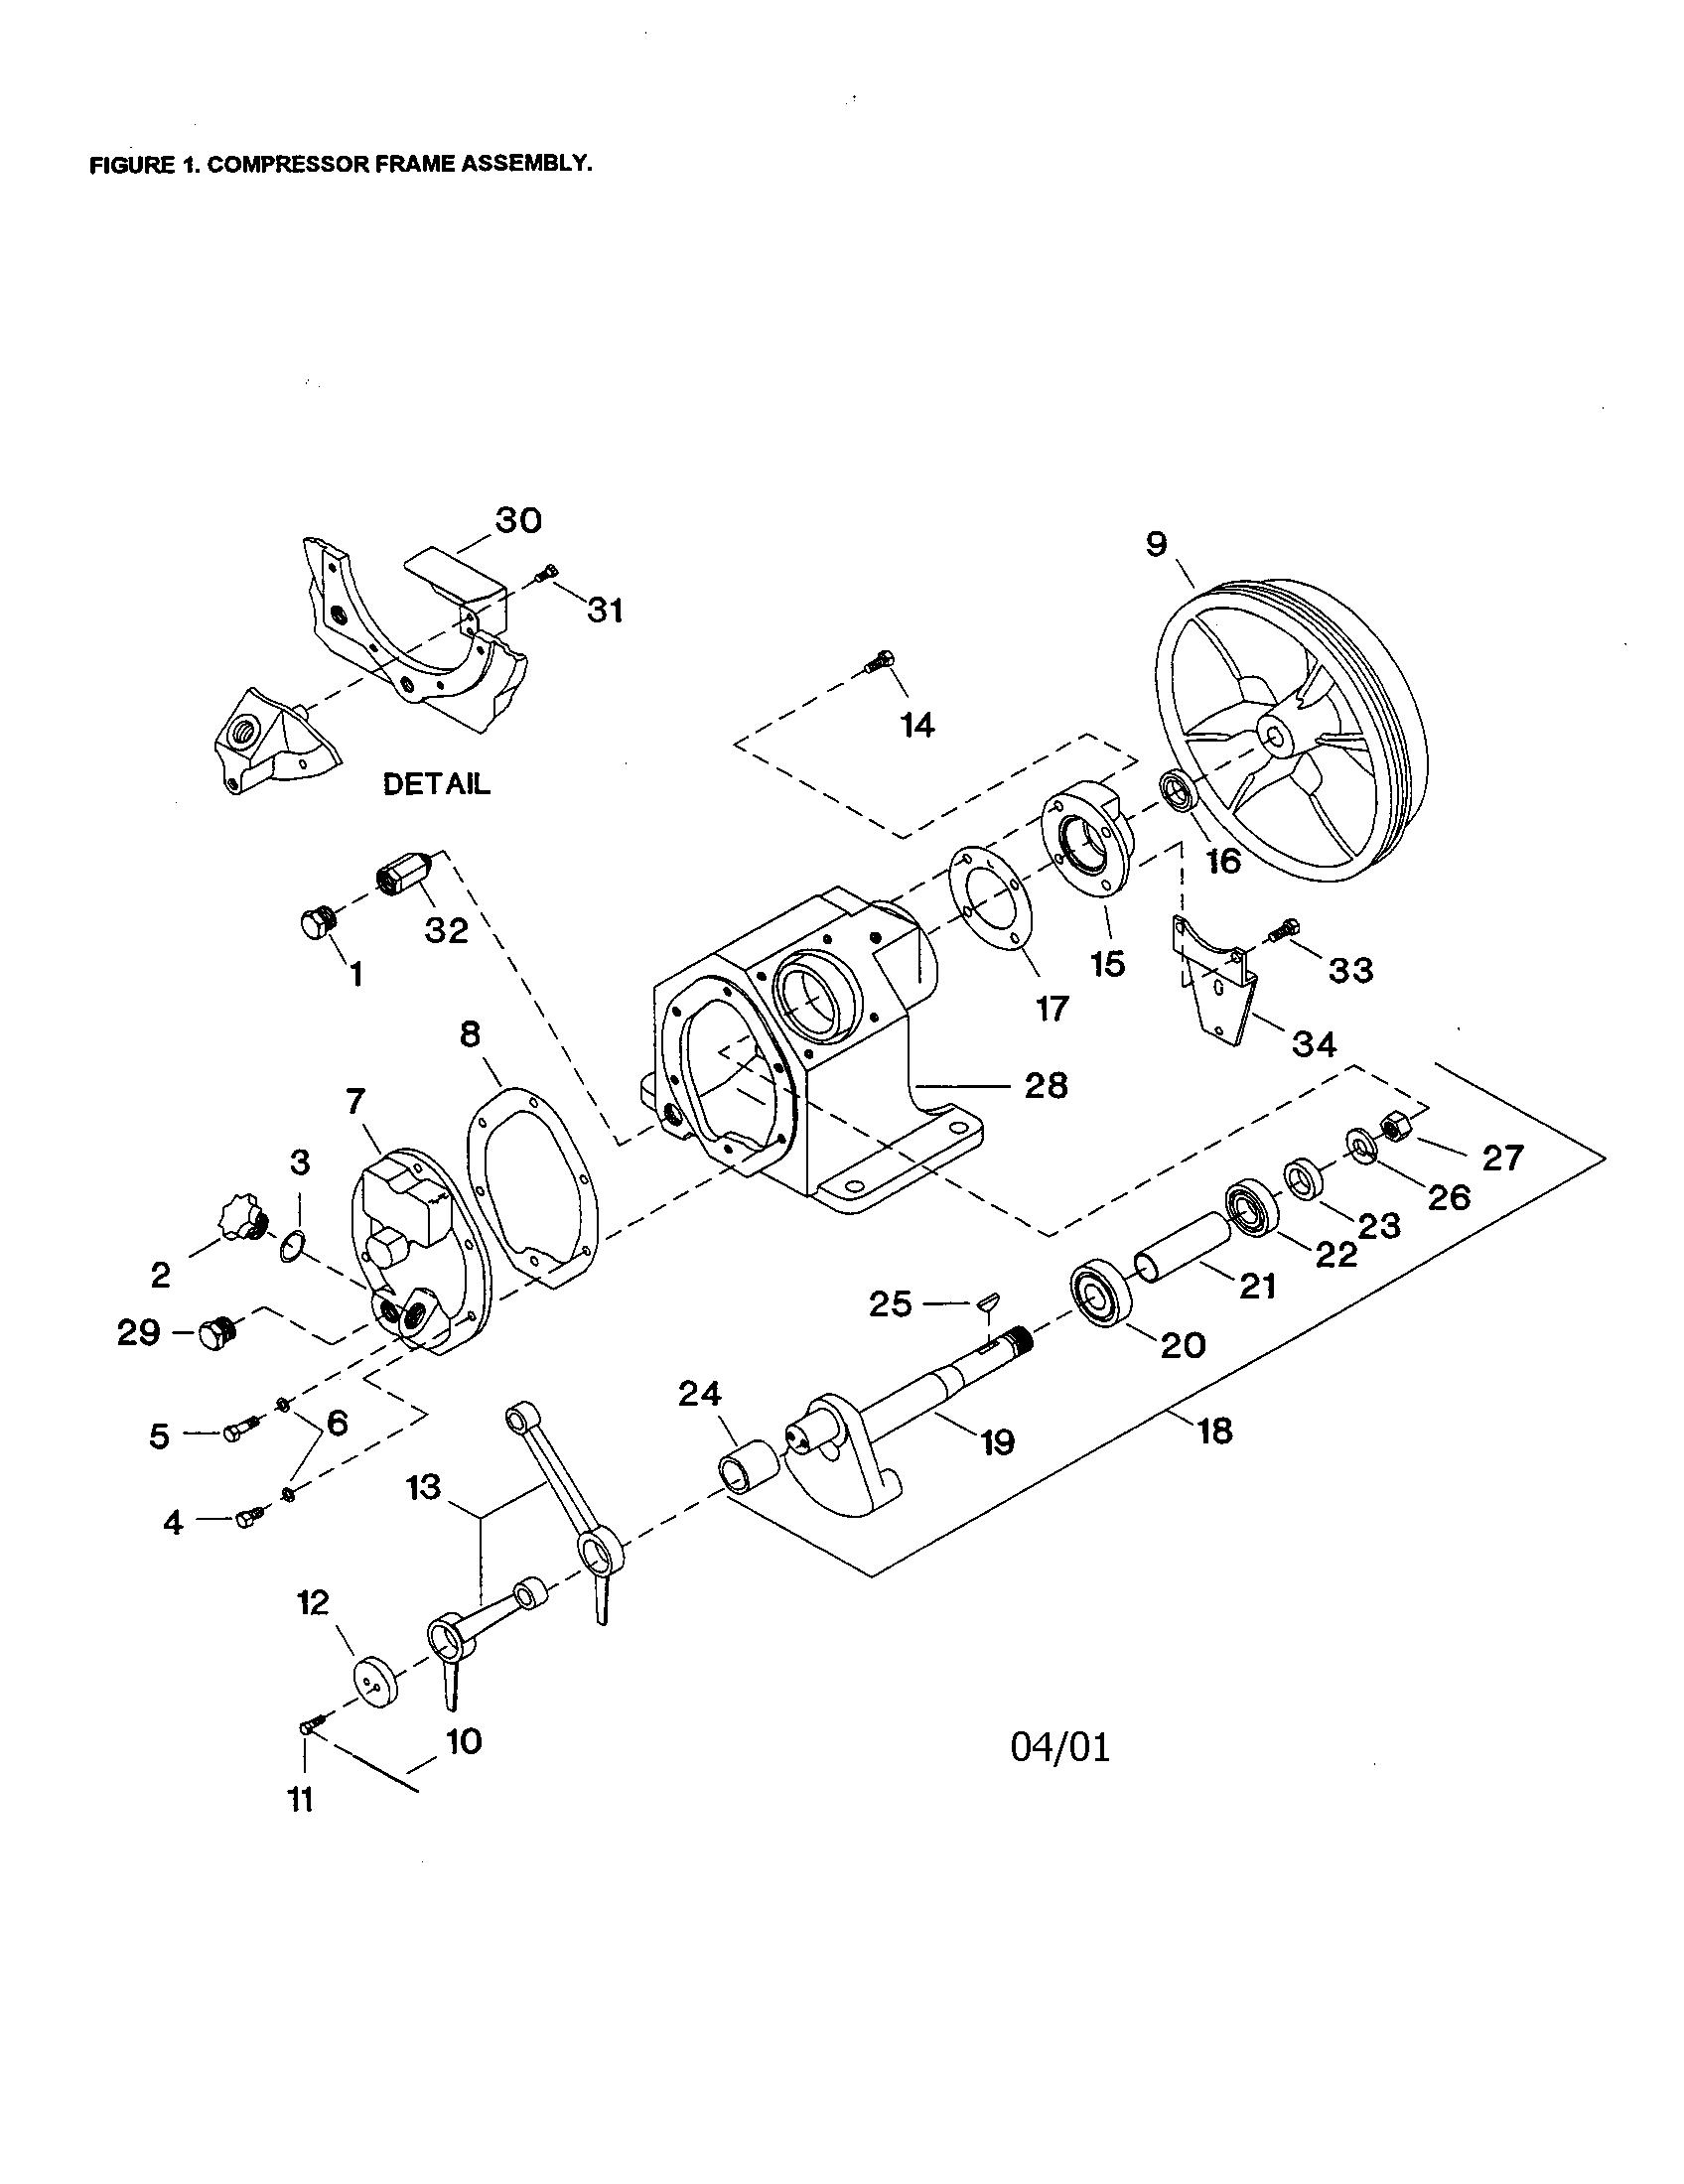 hight resolution of ingersoll rand 2340l5 compressor frame diagram